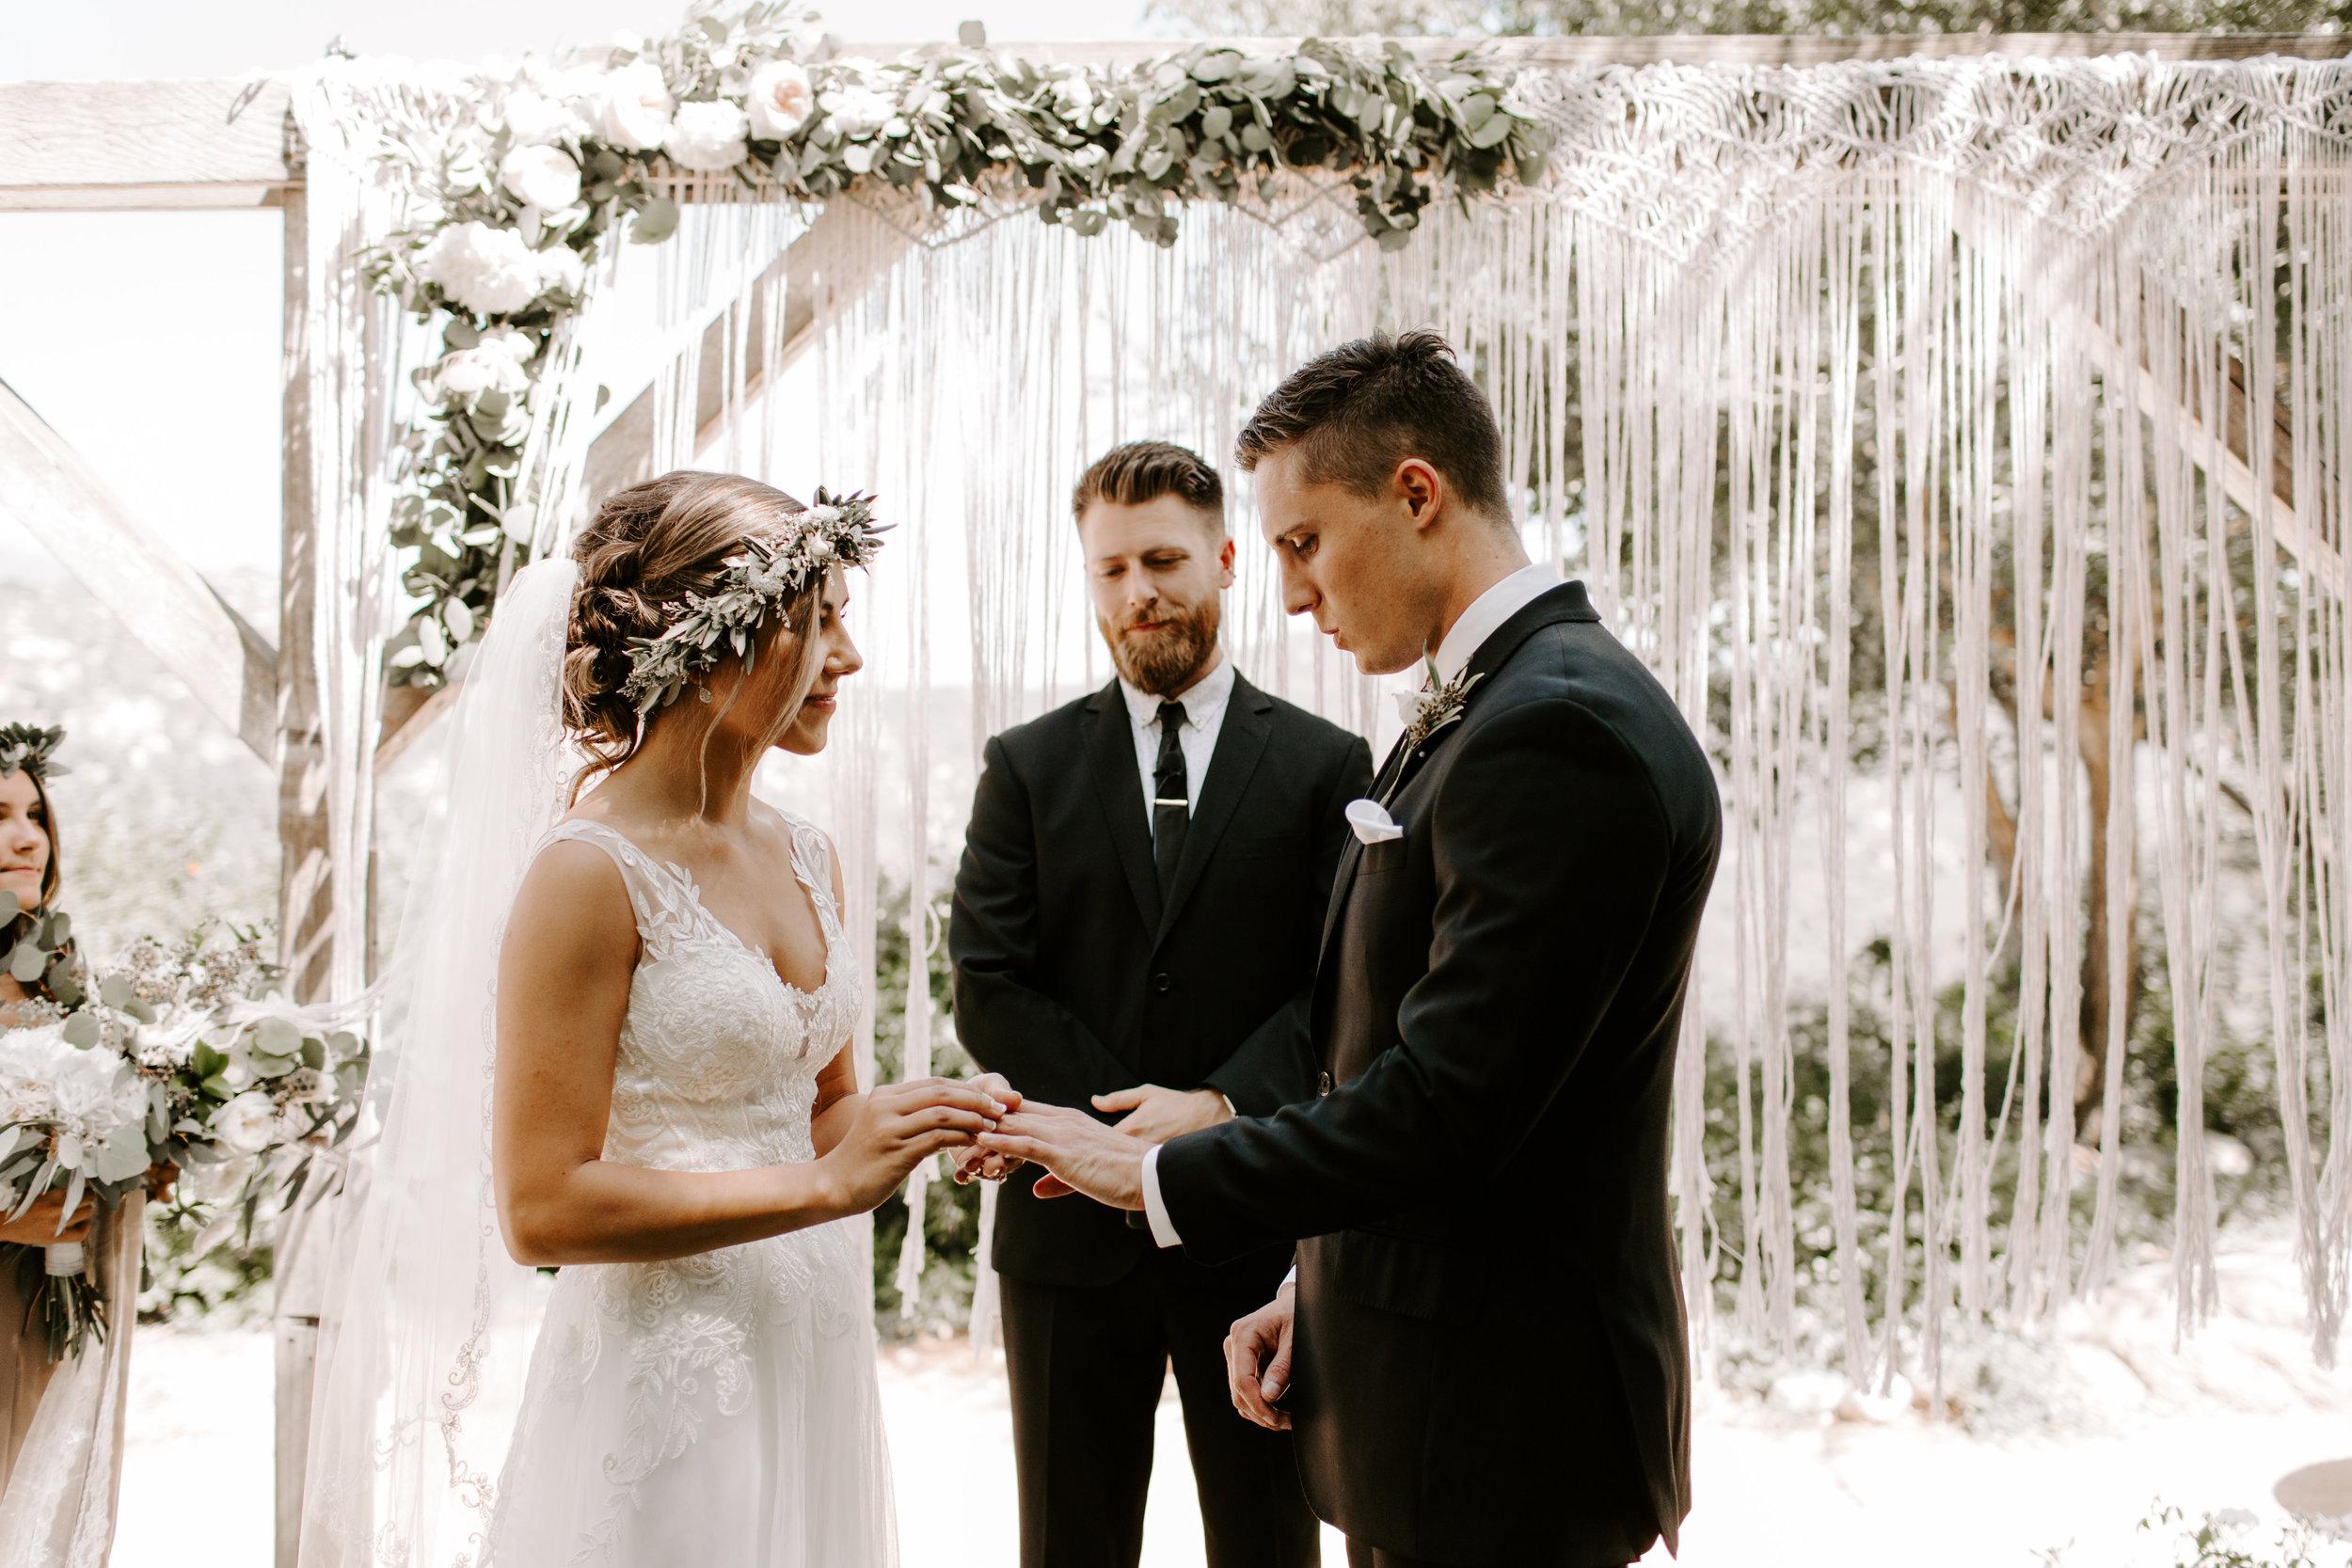 kate+zack_wedding_secludedgardenestate_temecula_madisonrylee_0367.jpg